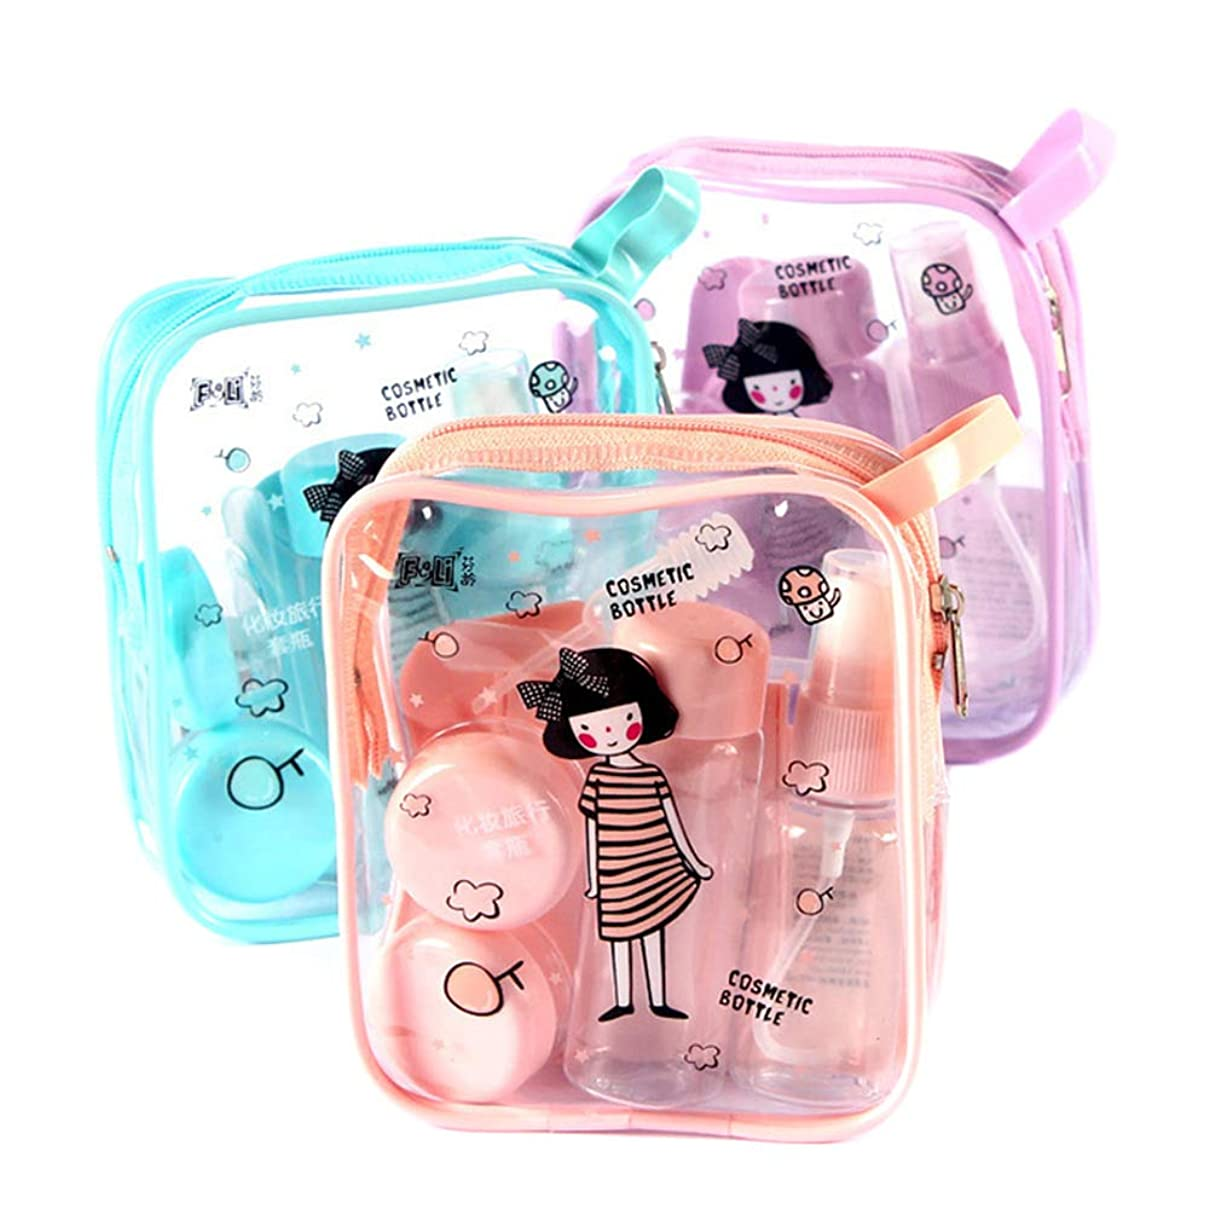 BTFirst 8個/ミニプラスチック化粧品容器透明空ボトル旅行